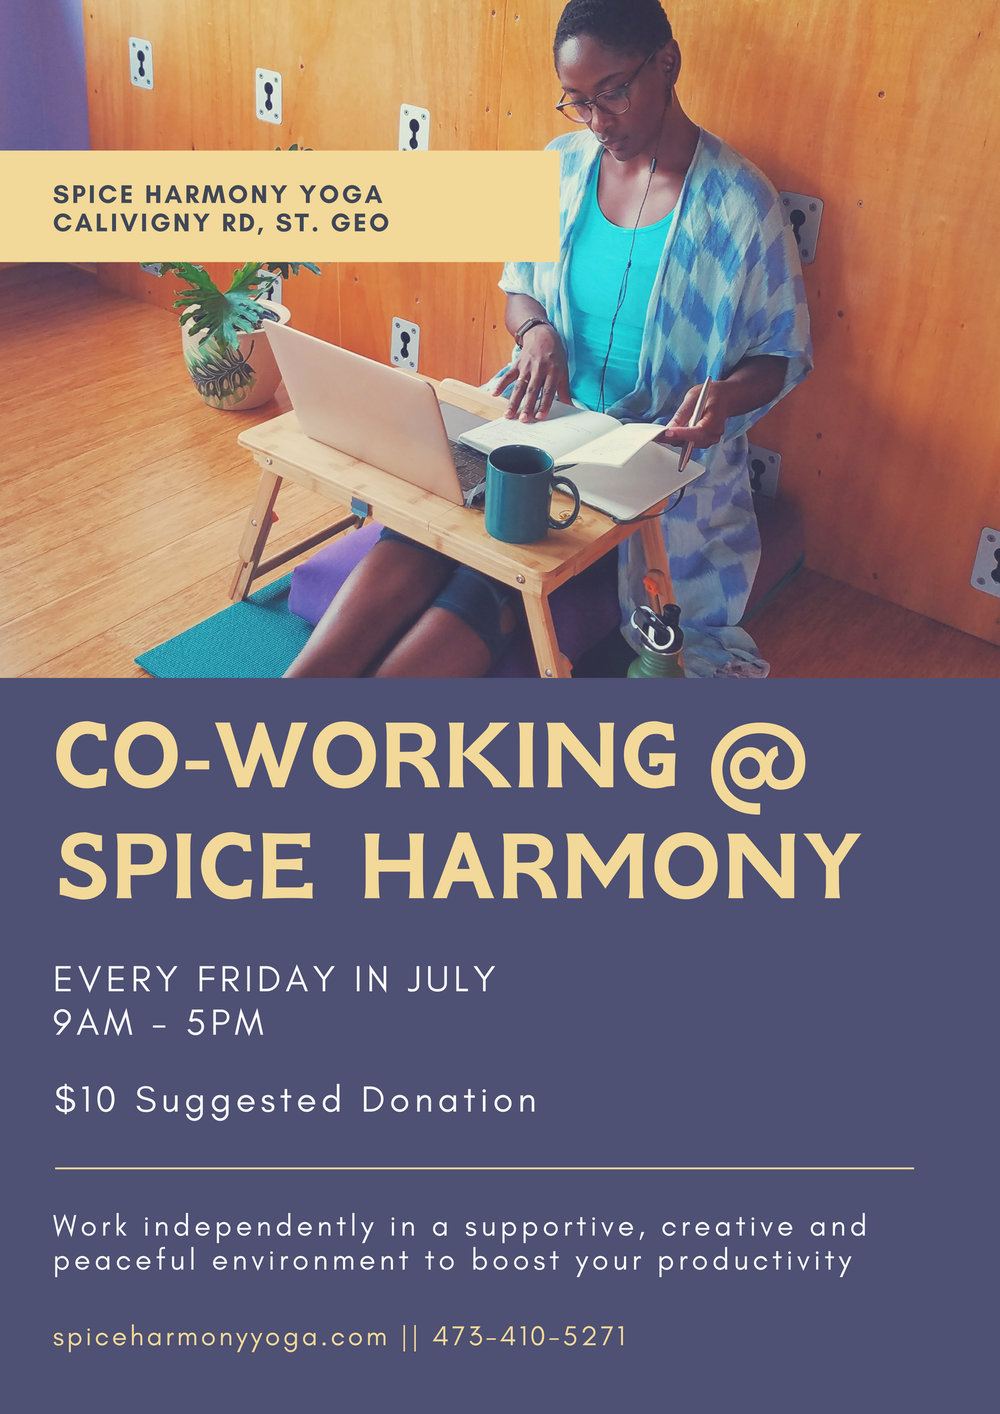 Co-working @ Spice Harmony.jpg